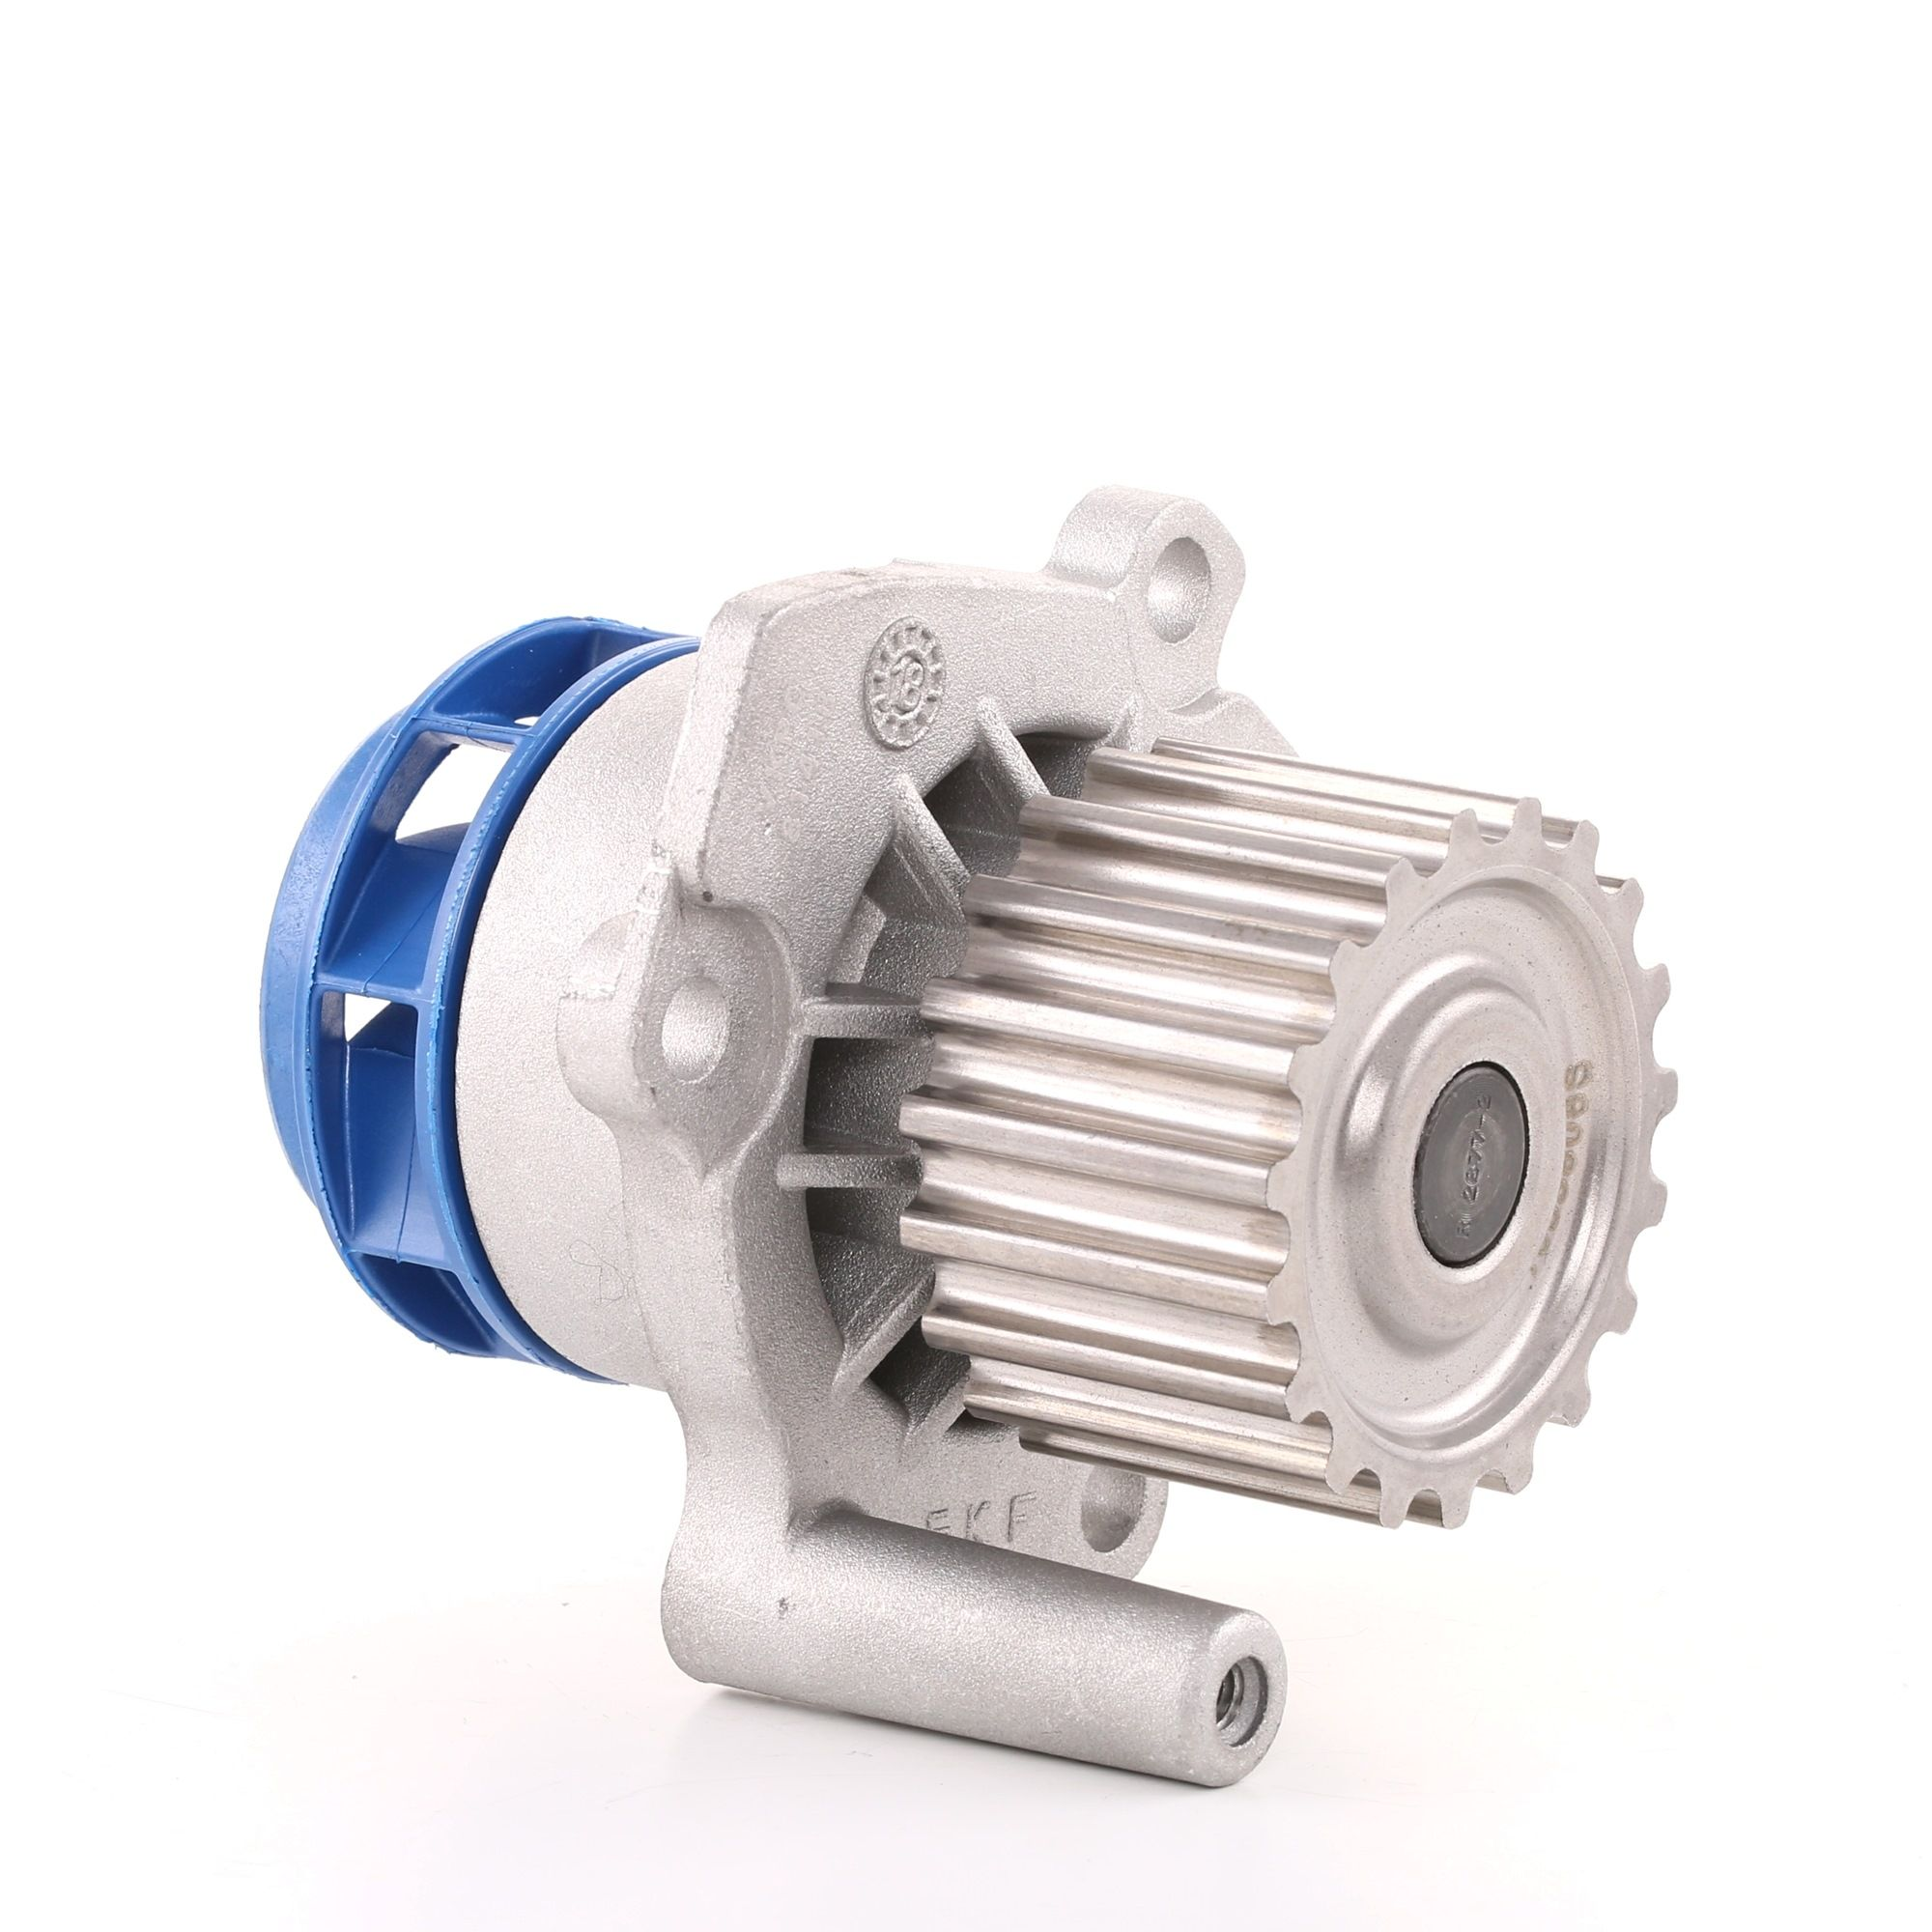 Kühlwasserpumpe SKF VKPC 81418 Bewertung